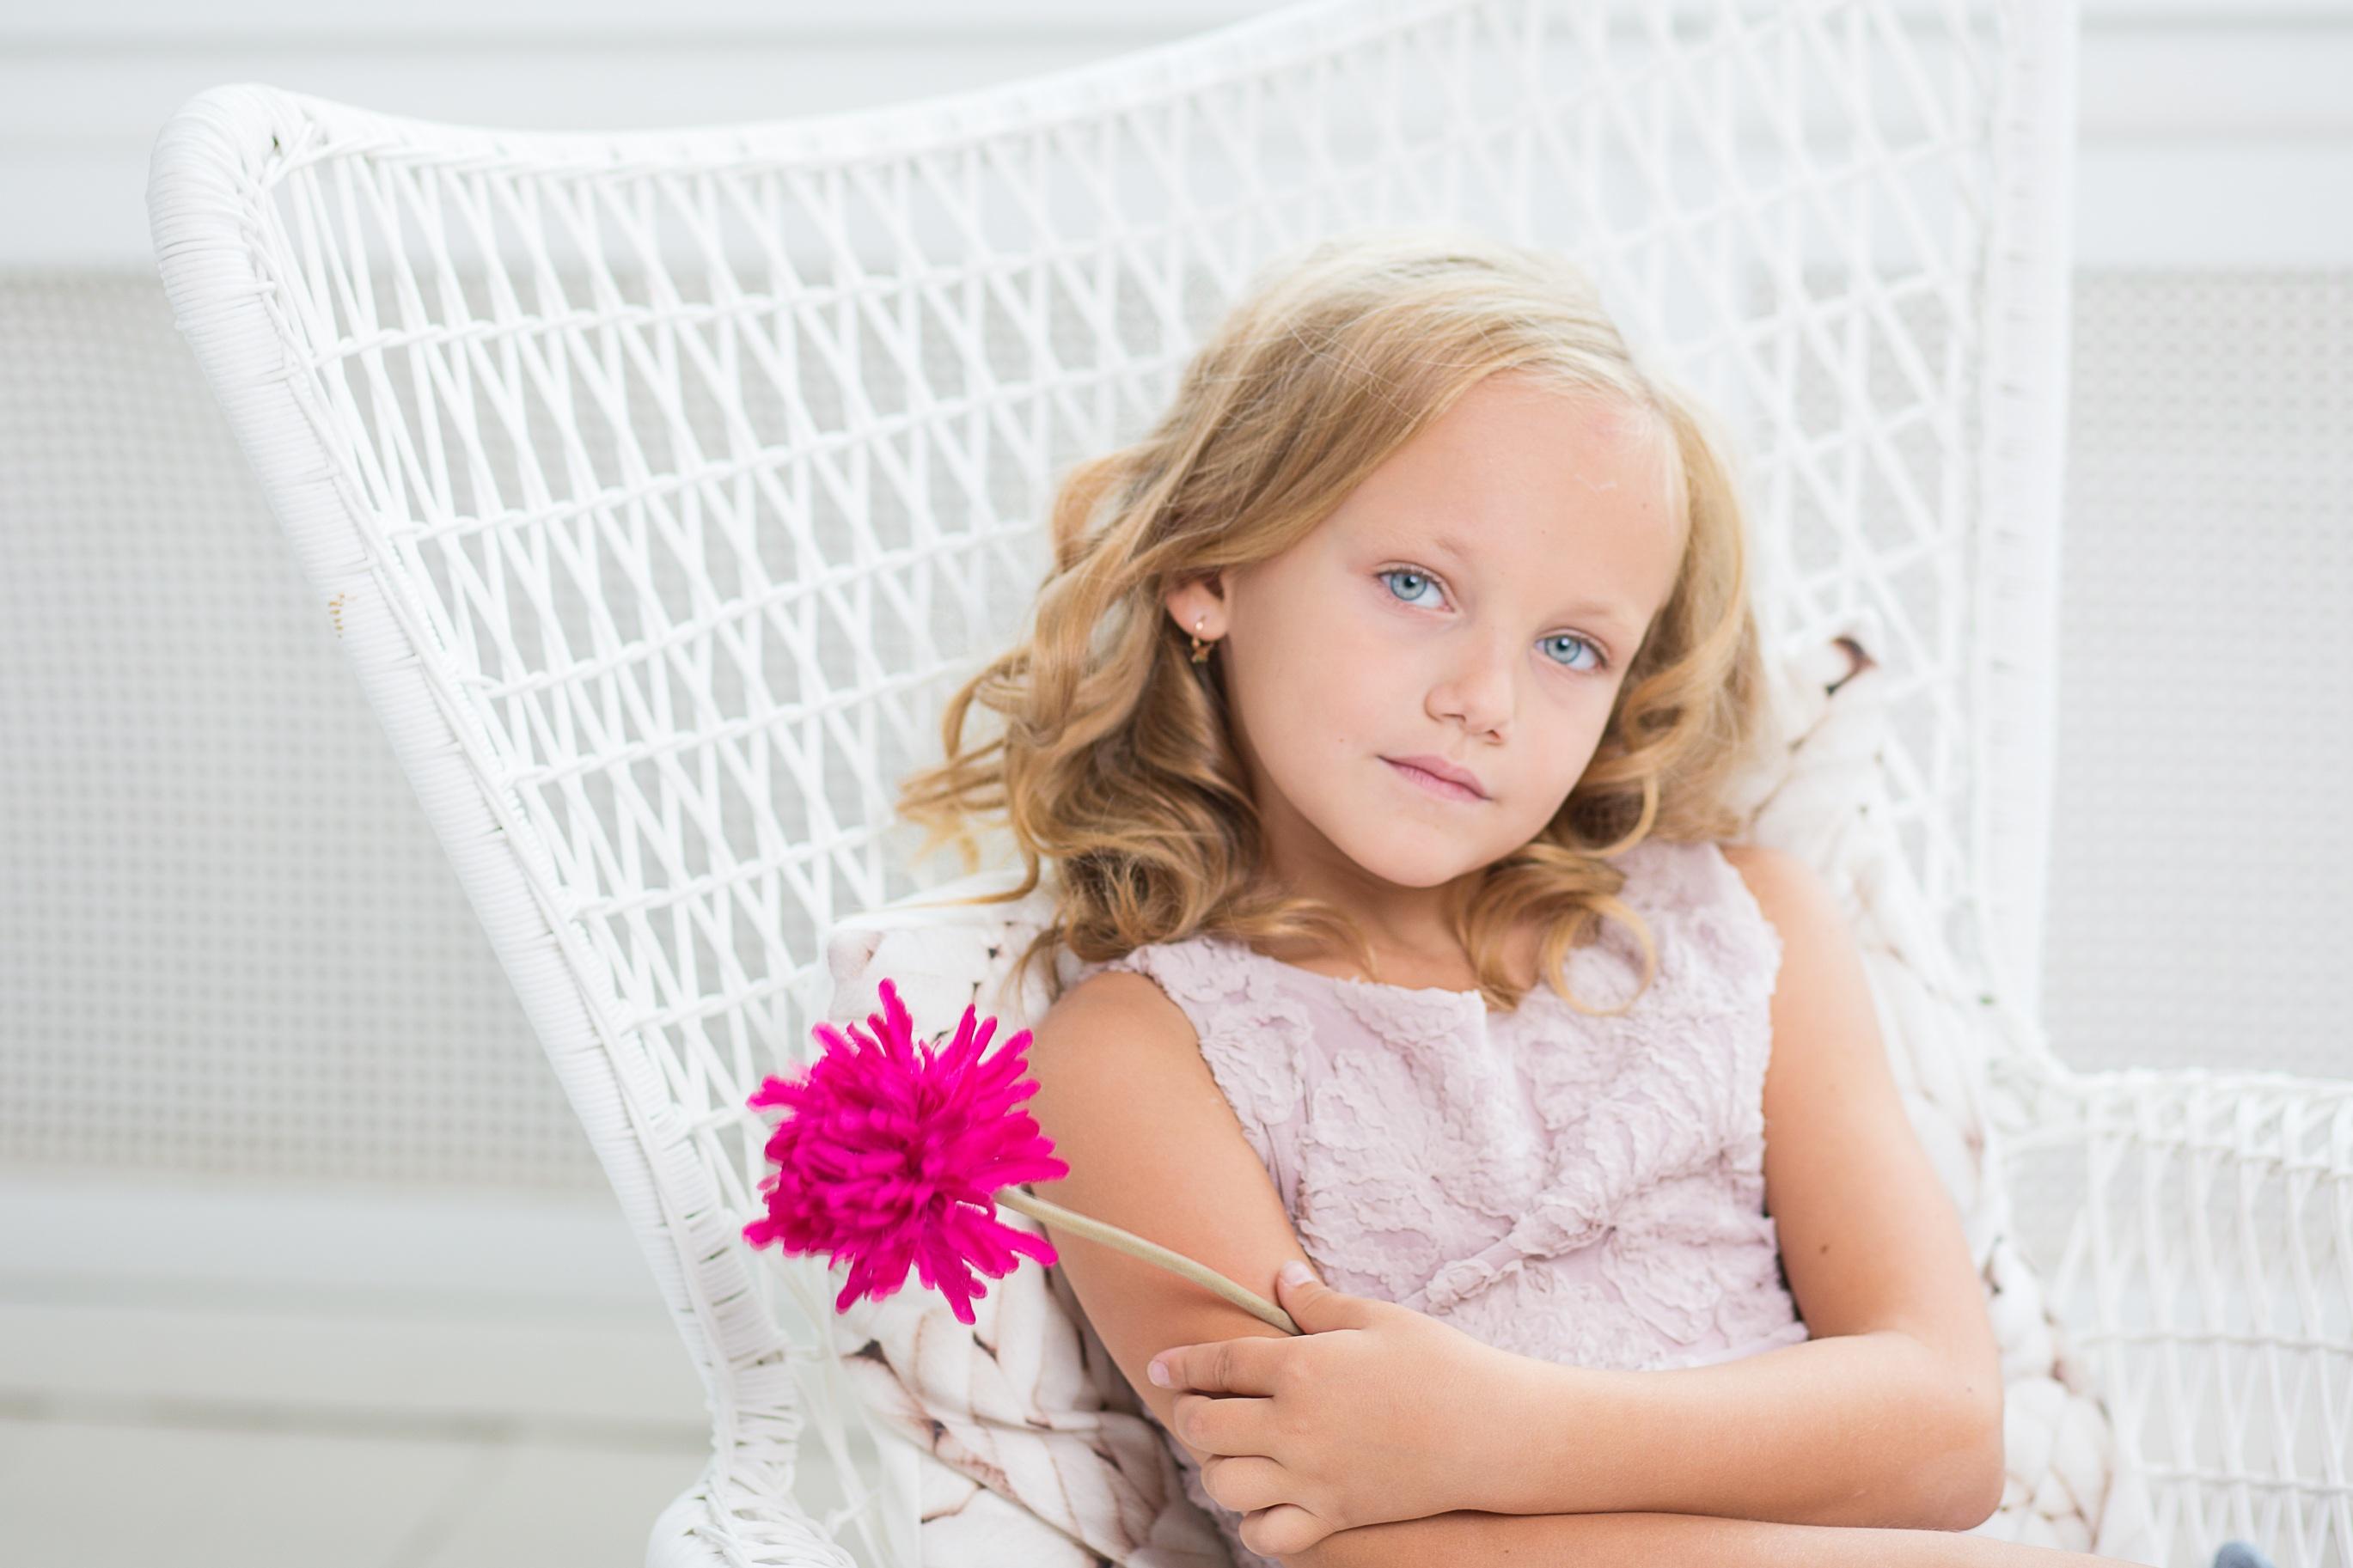 fata educatie parinti - sfatulparintilor.ro - pixabay_com